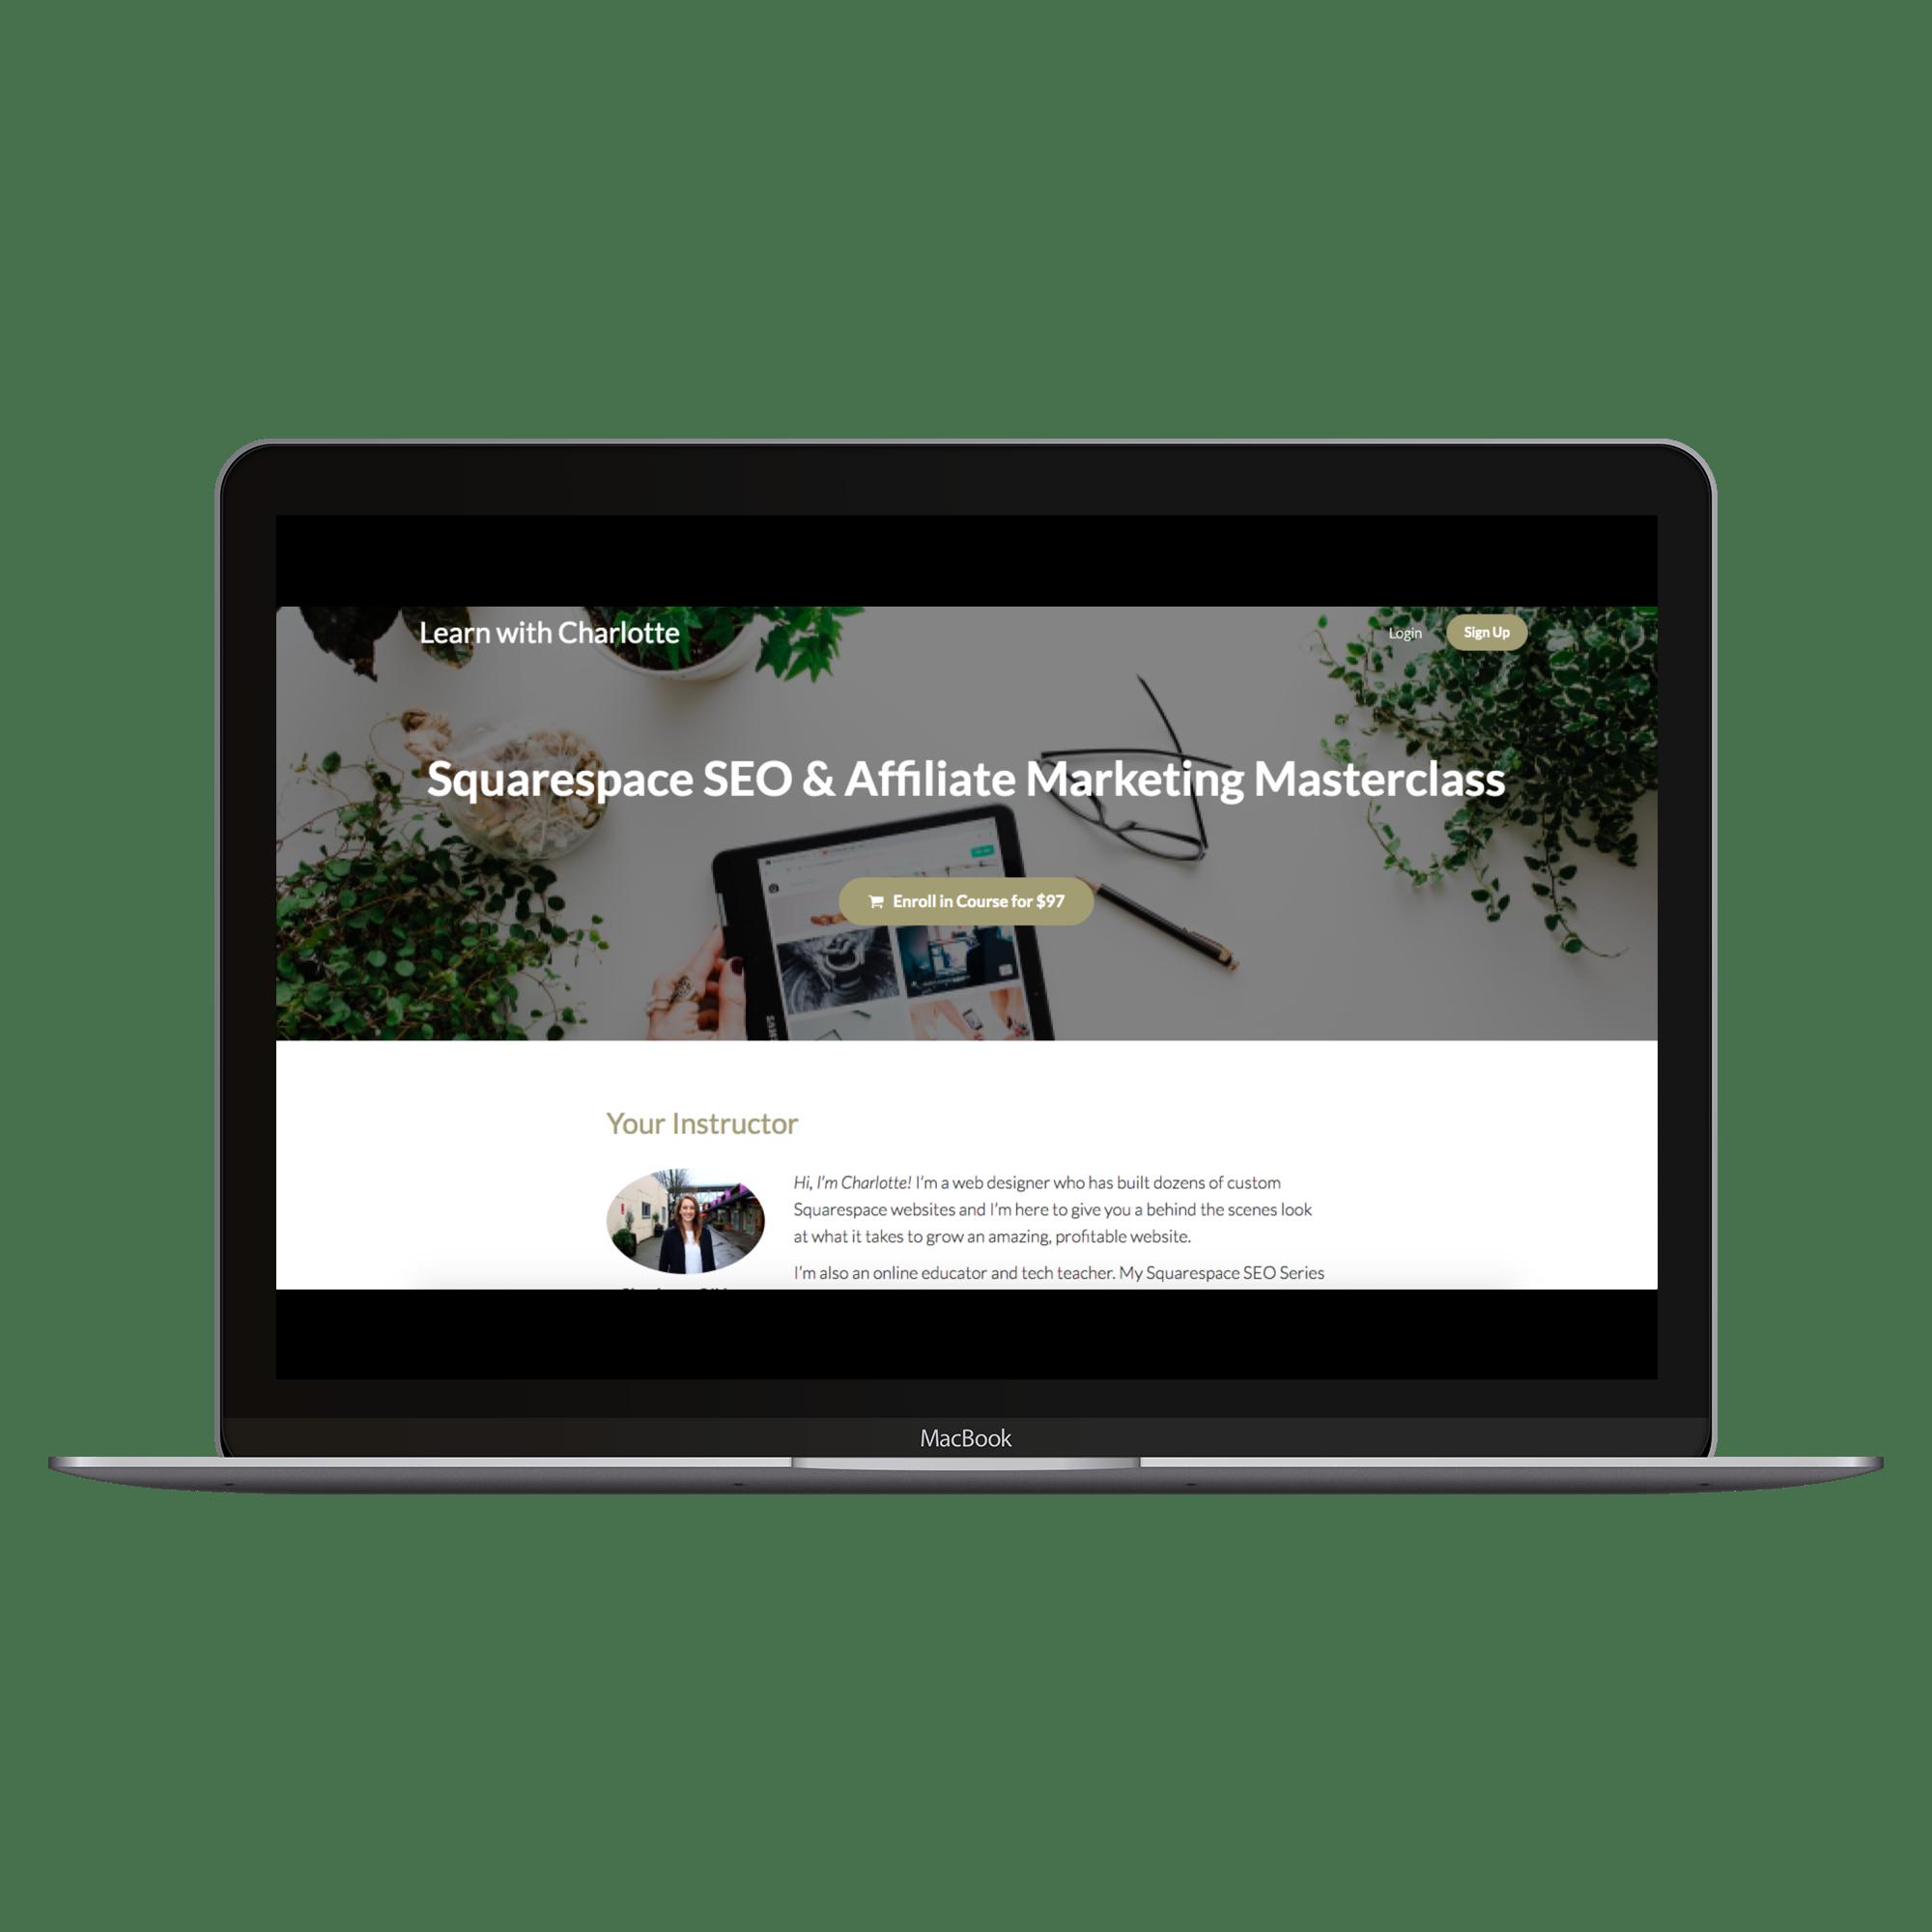 Squarespace SEO for affiliate marketing masterclass teachable mockup.png